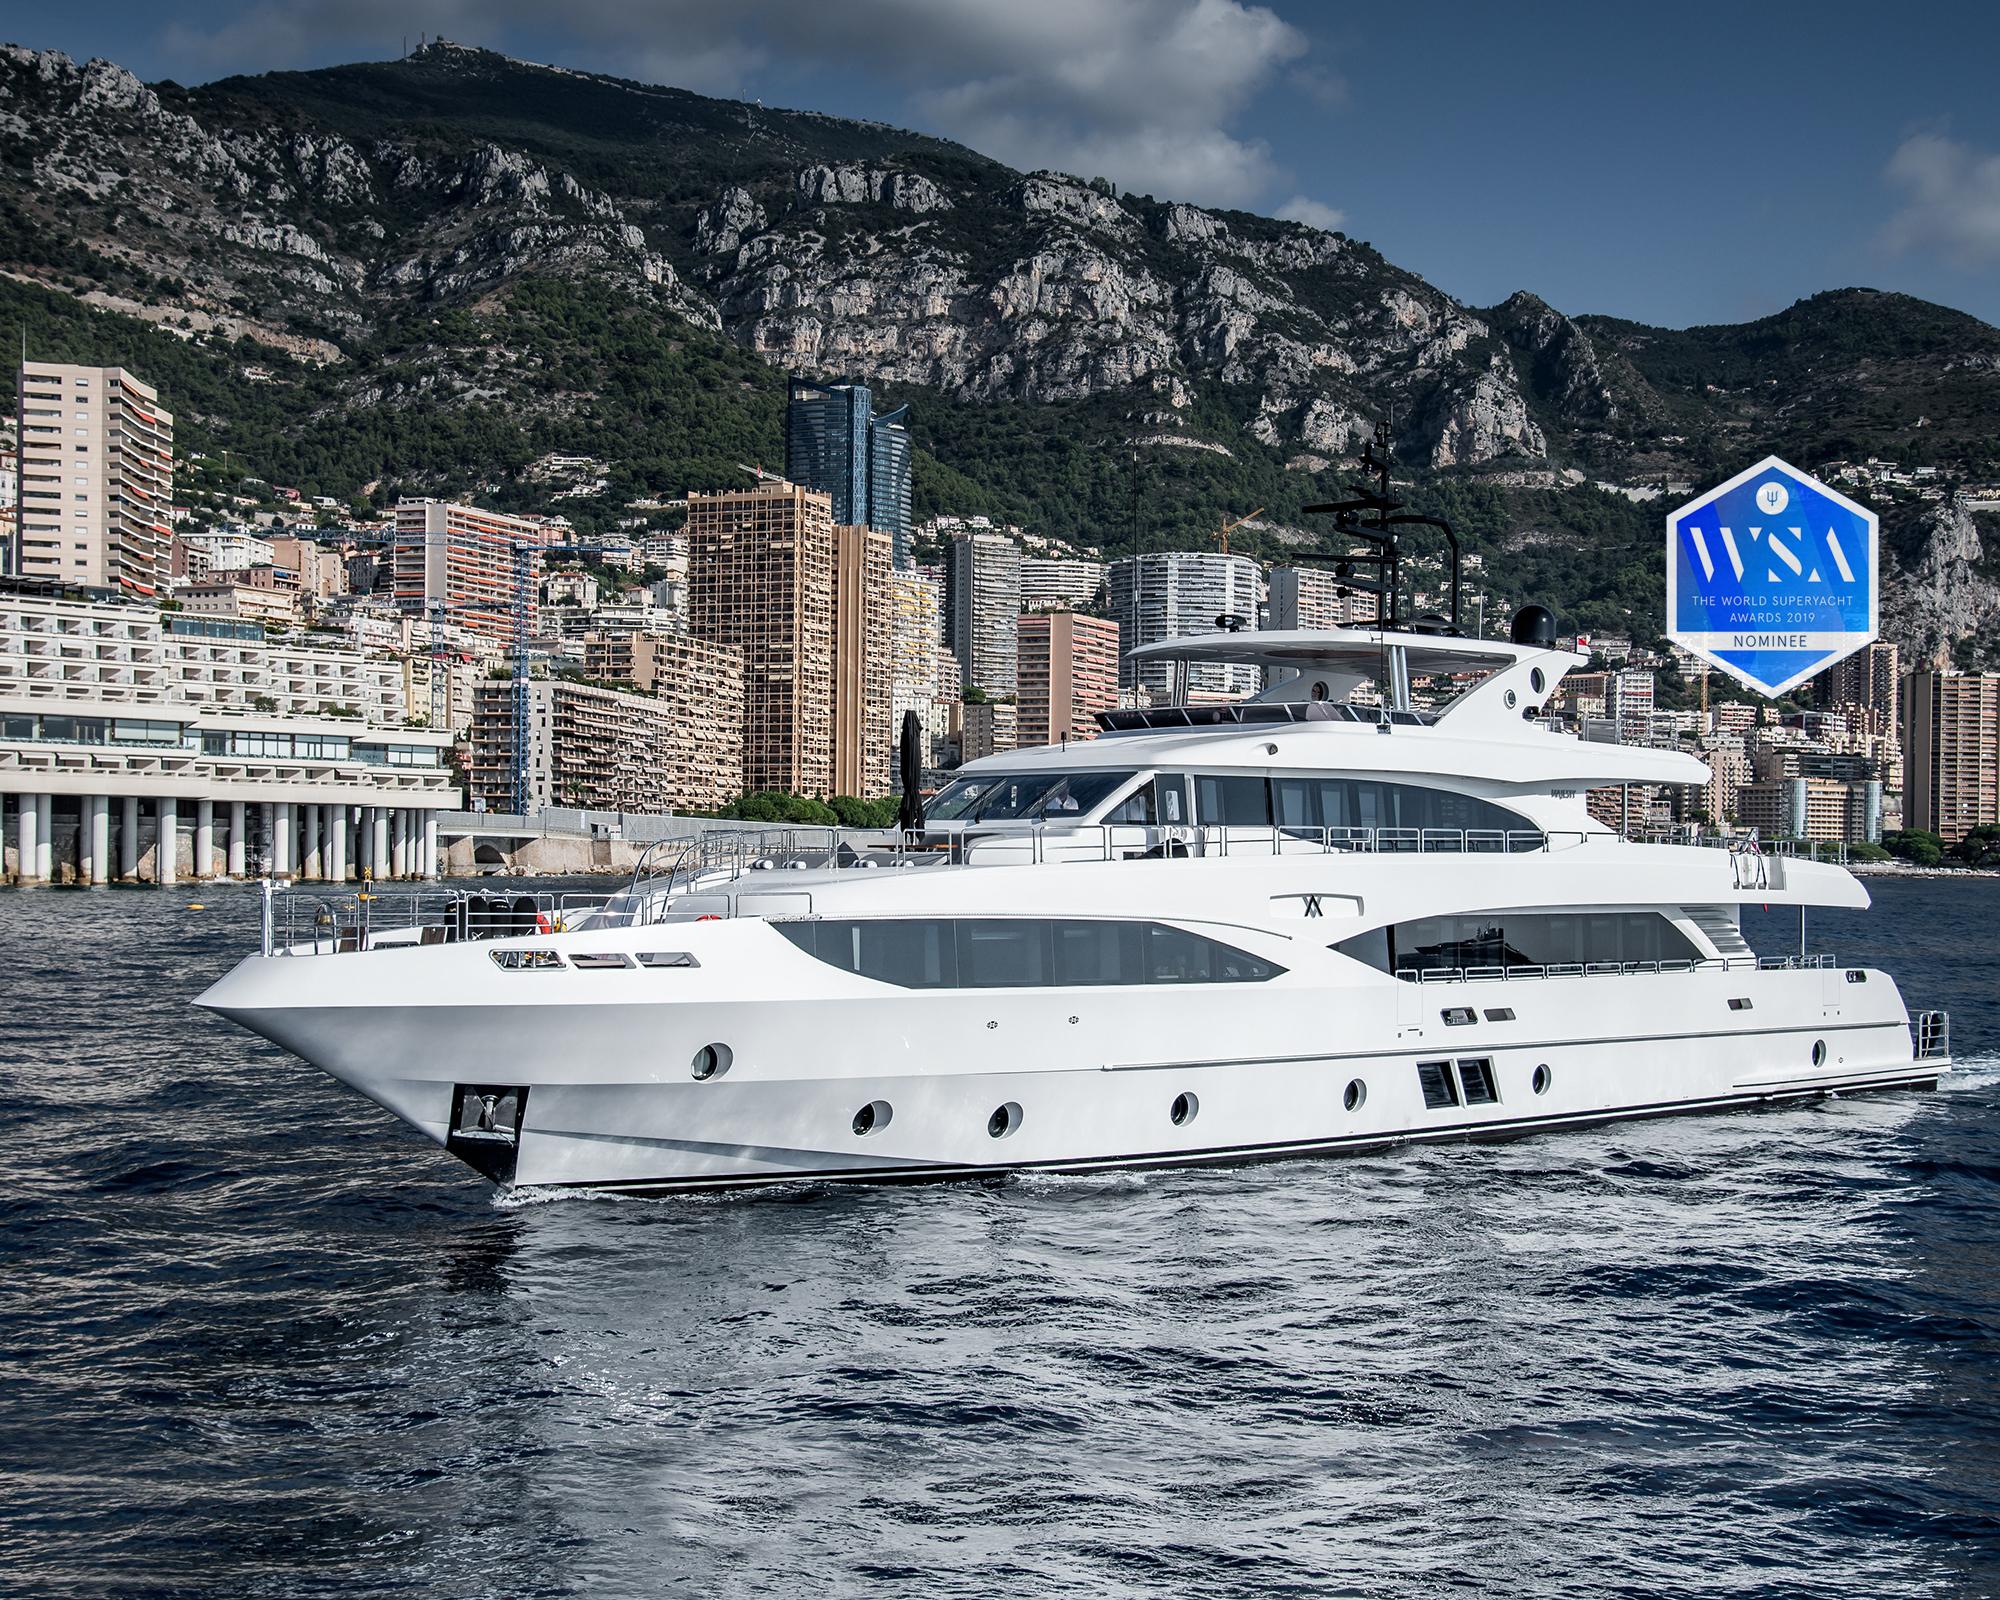 Majesty 125 World Superyacht Awards nominee